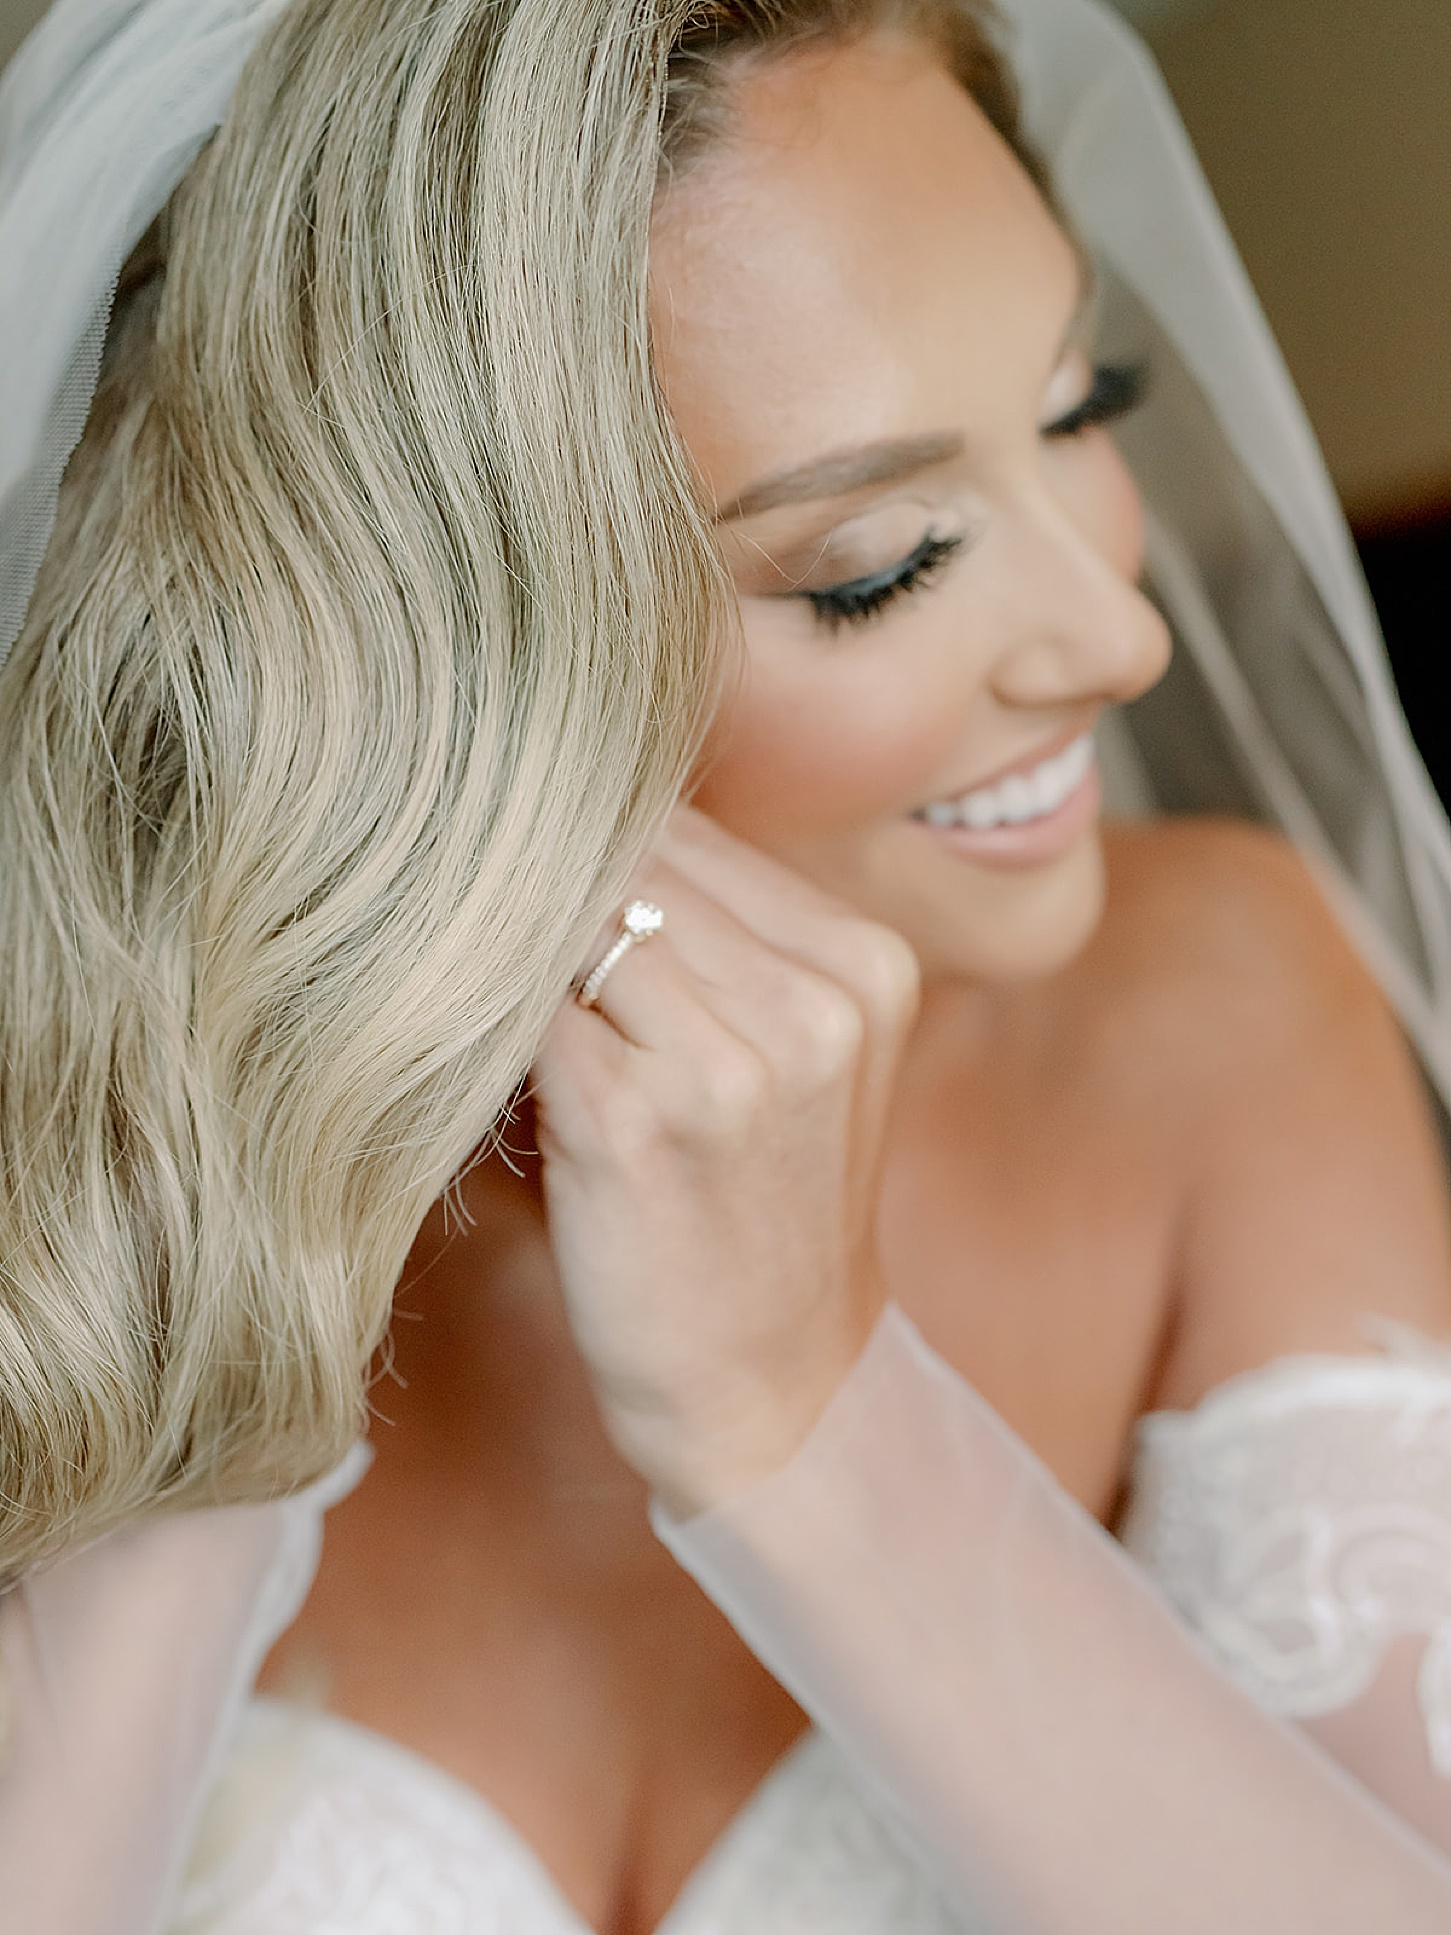 Atlantic City Wedding Photography Studio by Magdalena Studios Lexy Cha 0015